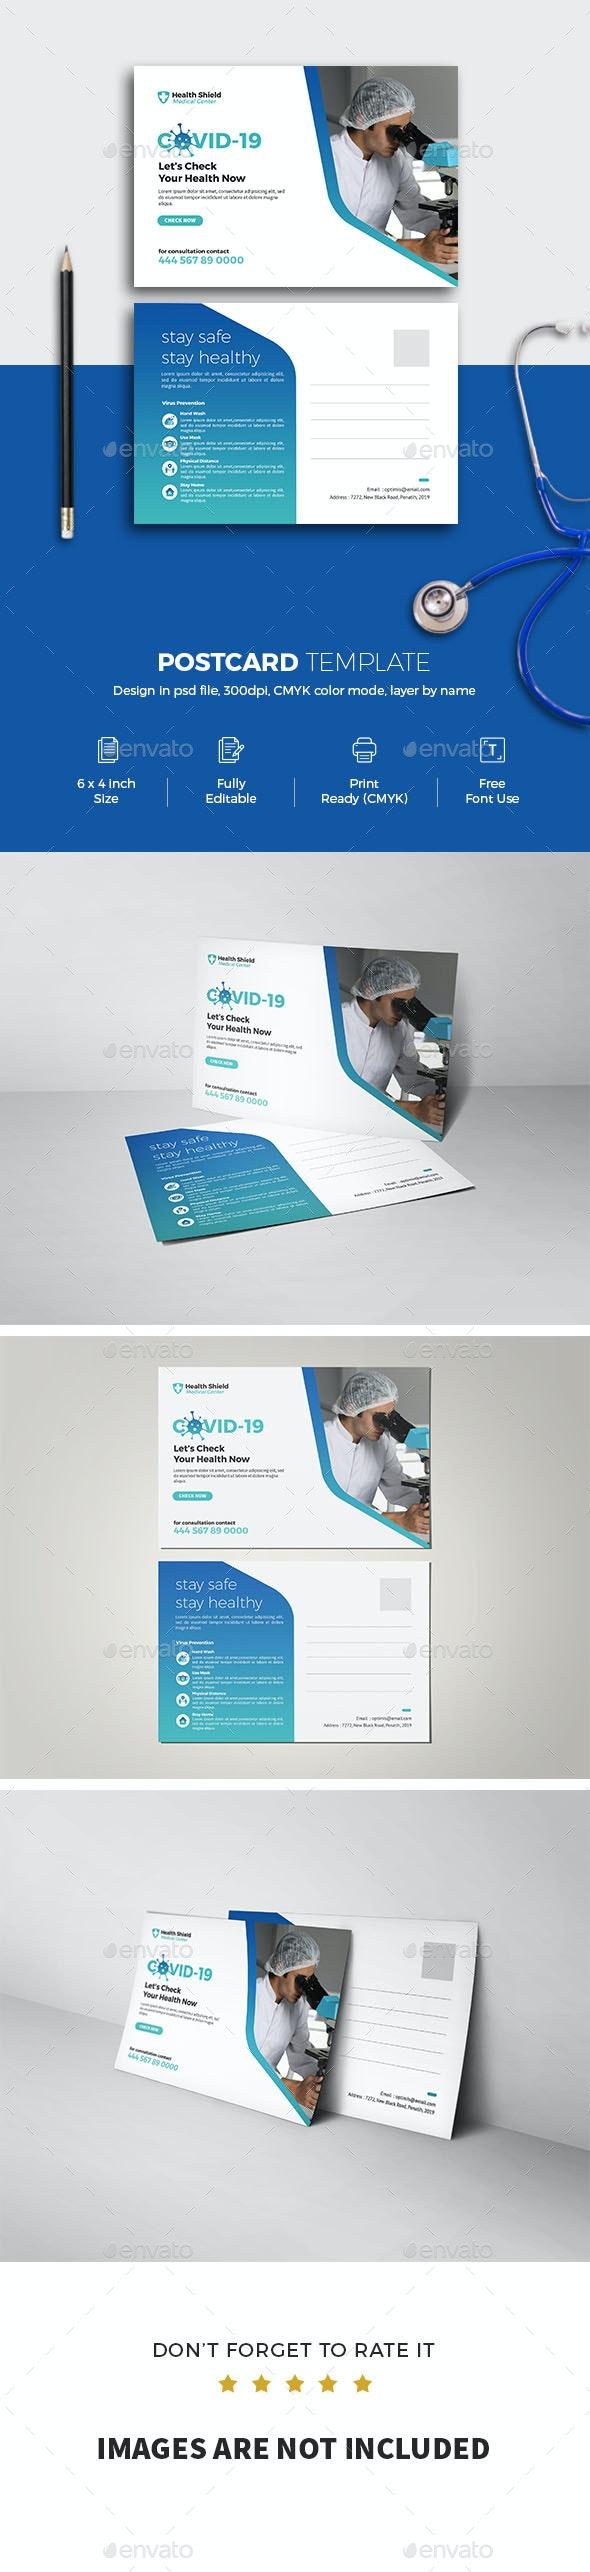 Covid 19 Postcard - Cards & Invites Print Templates